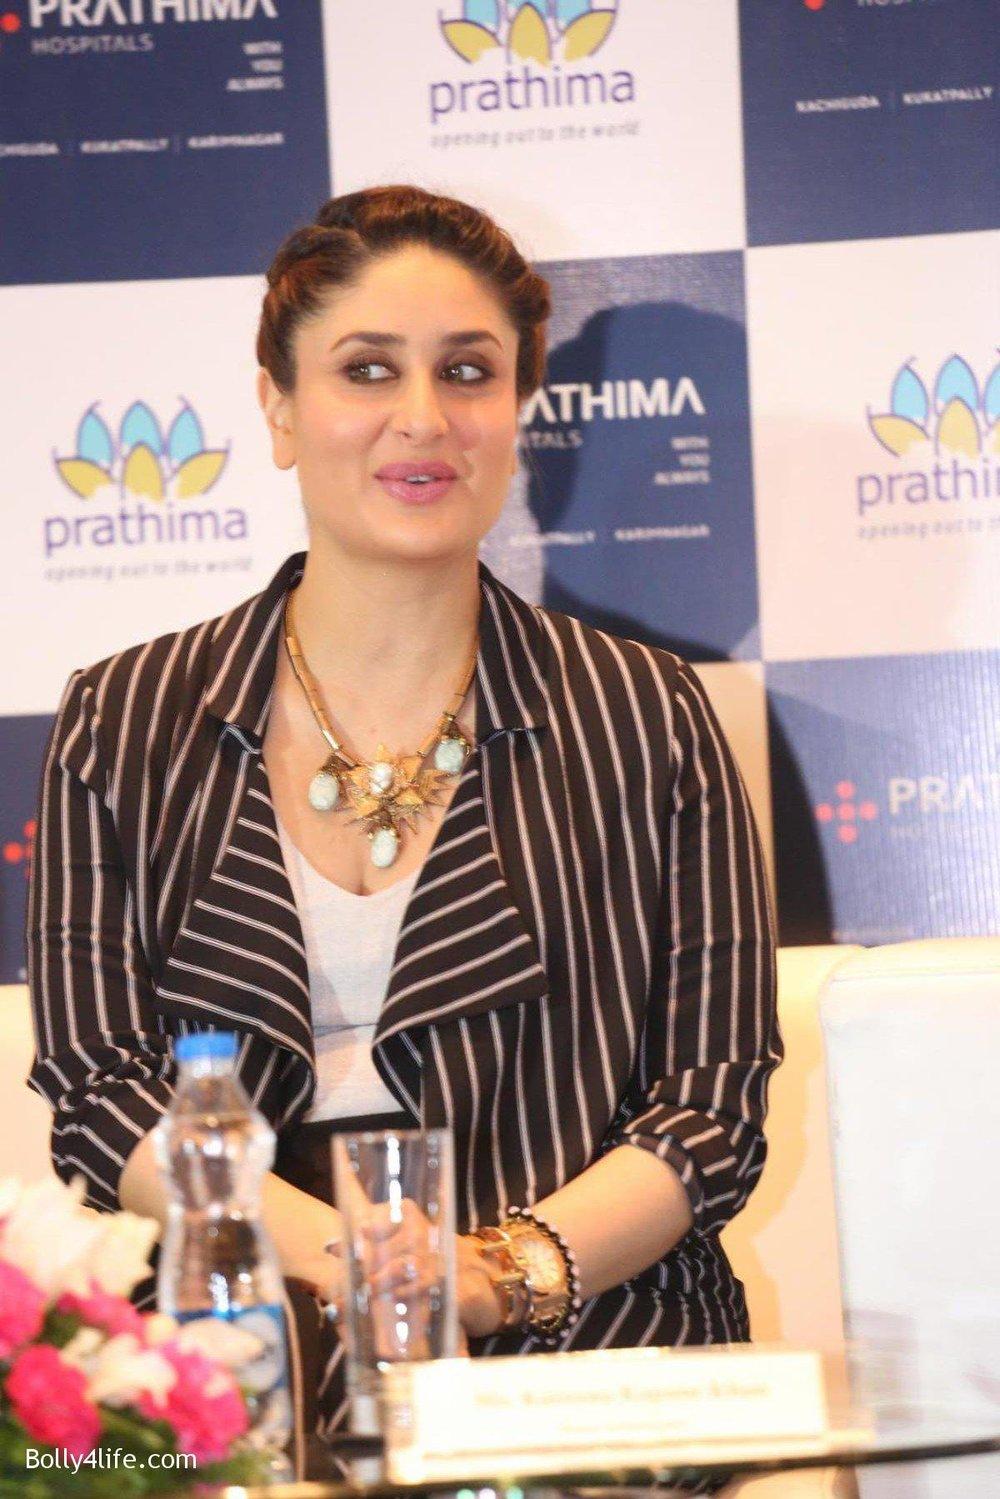 kareena-kapoor-prathima-hospitals-brand-ambassador-12.jpg